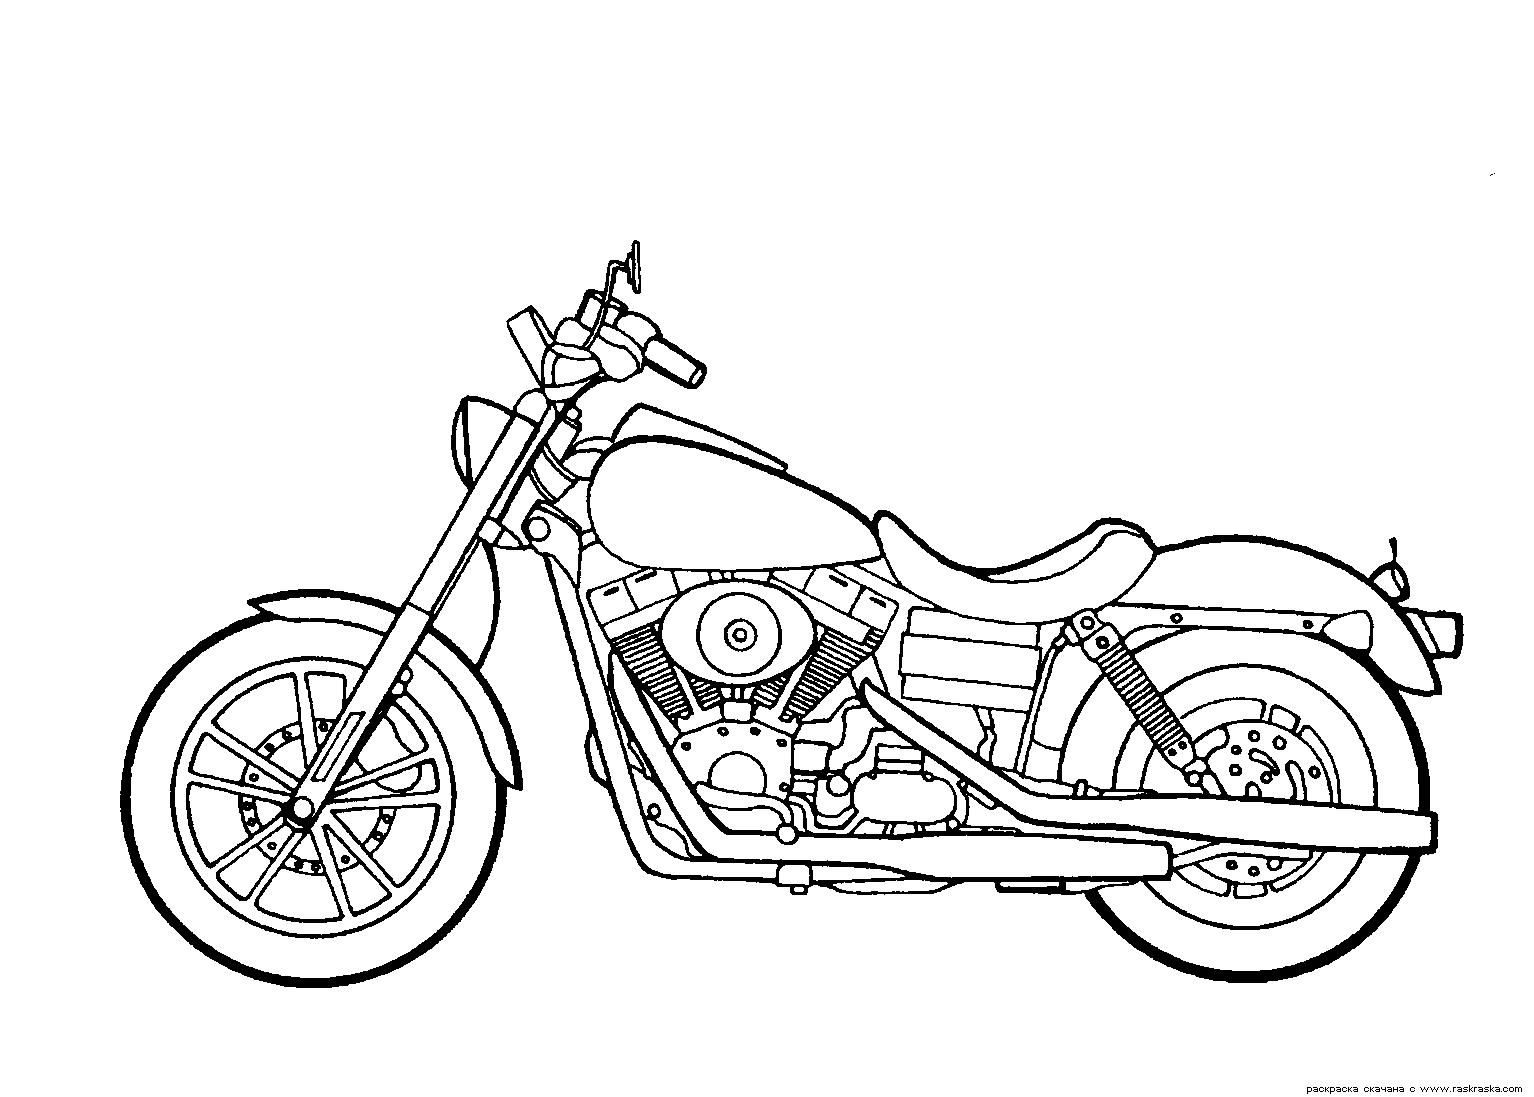 Motorcycles Harley Davidson Dyna Super Glide